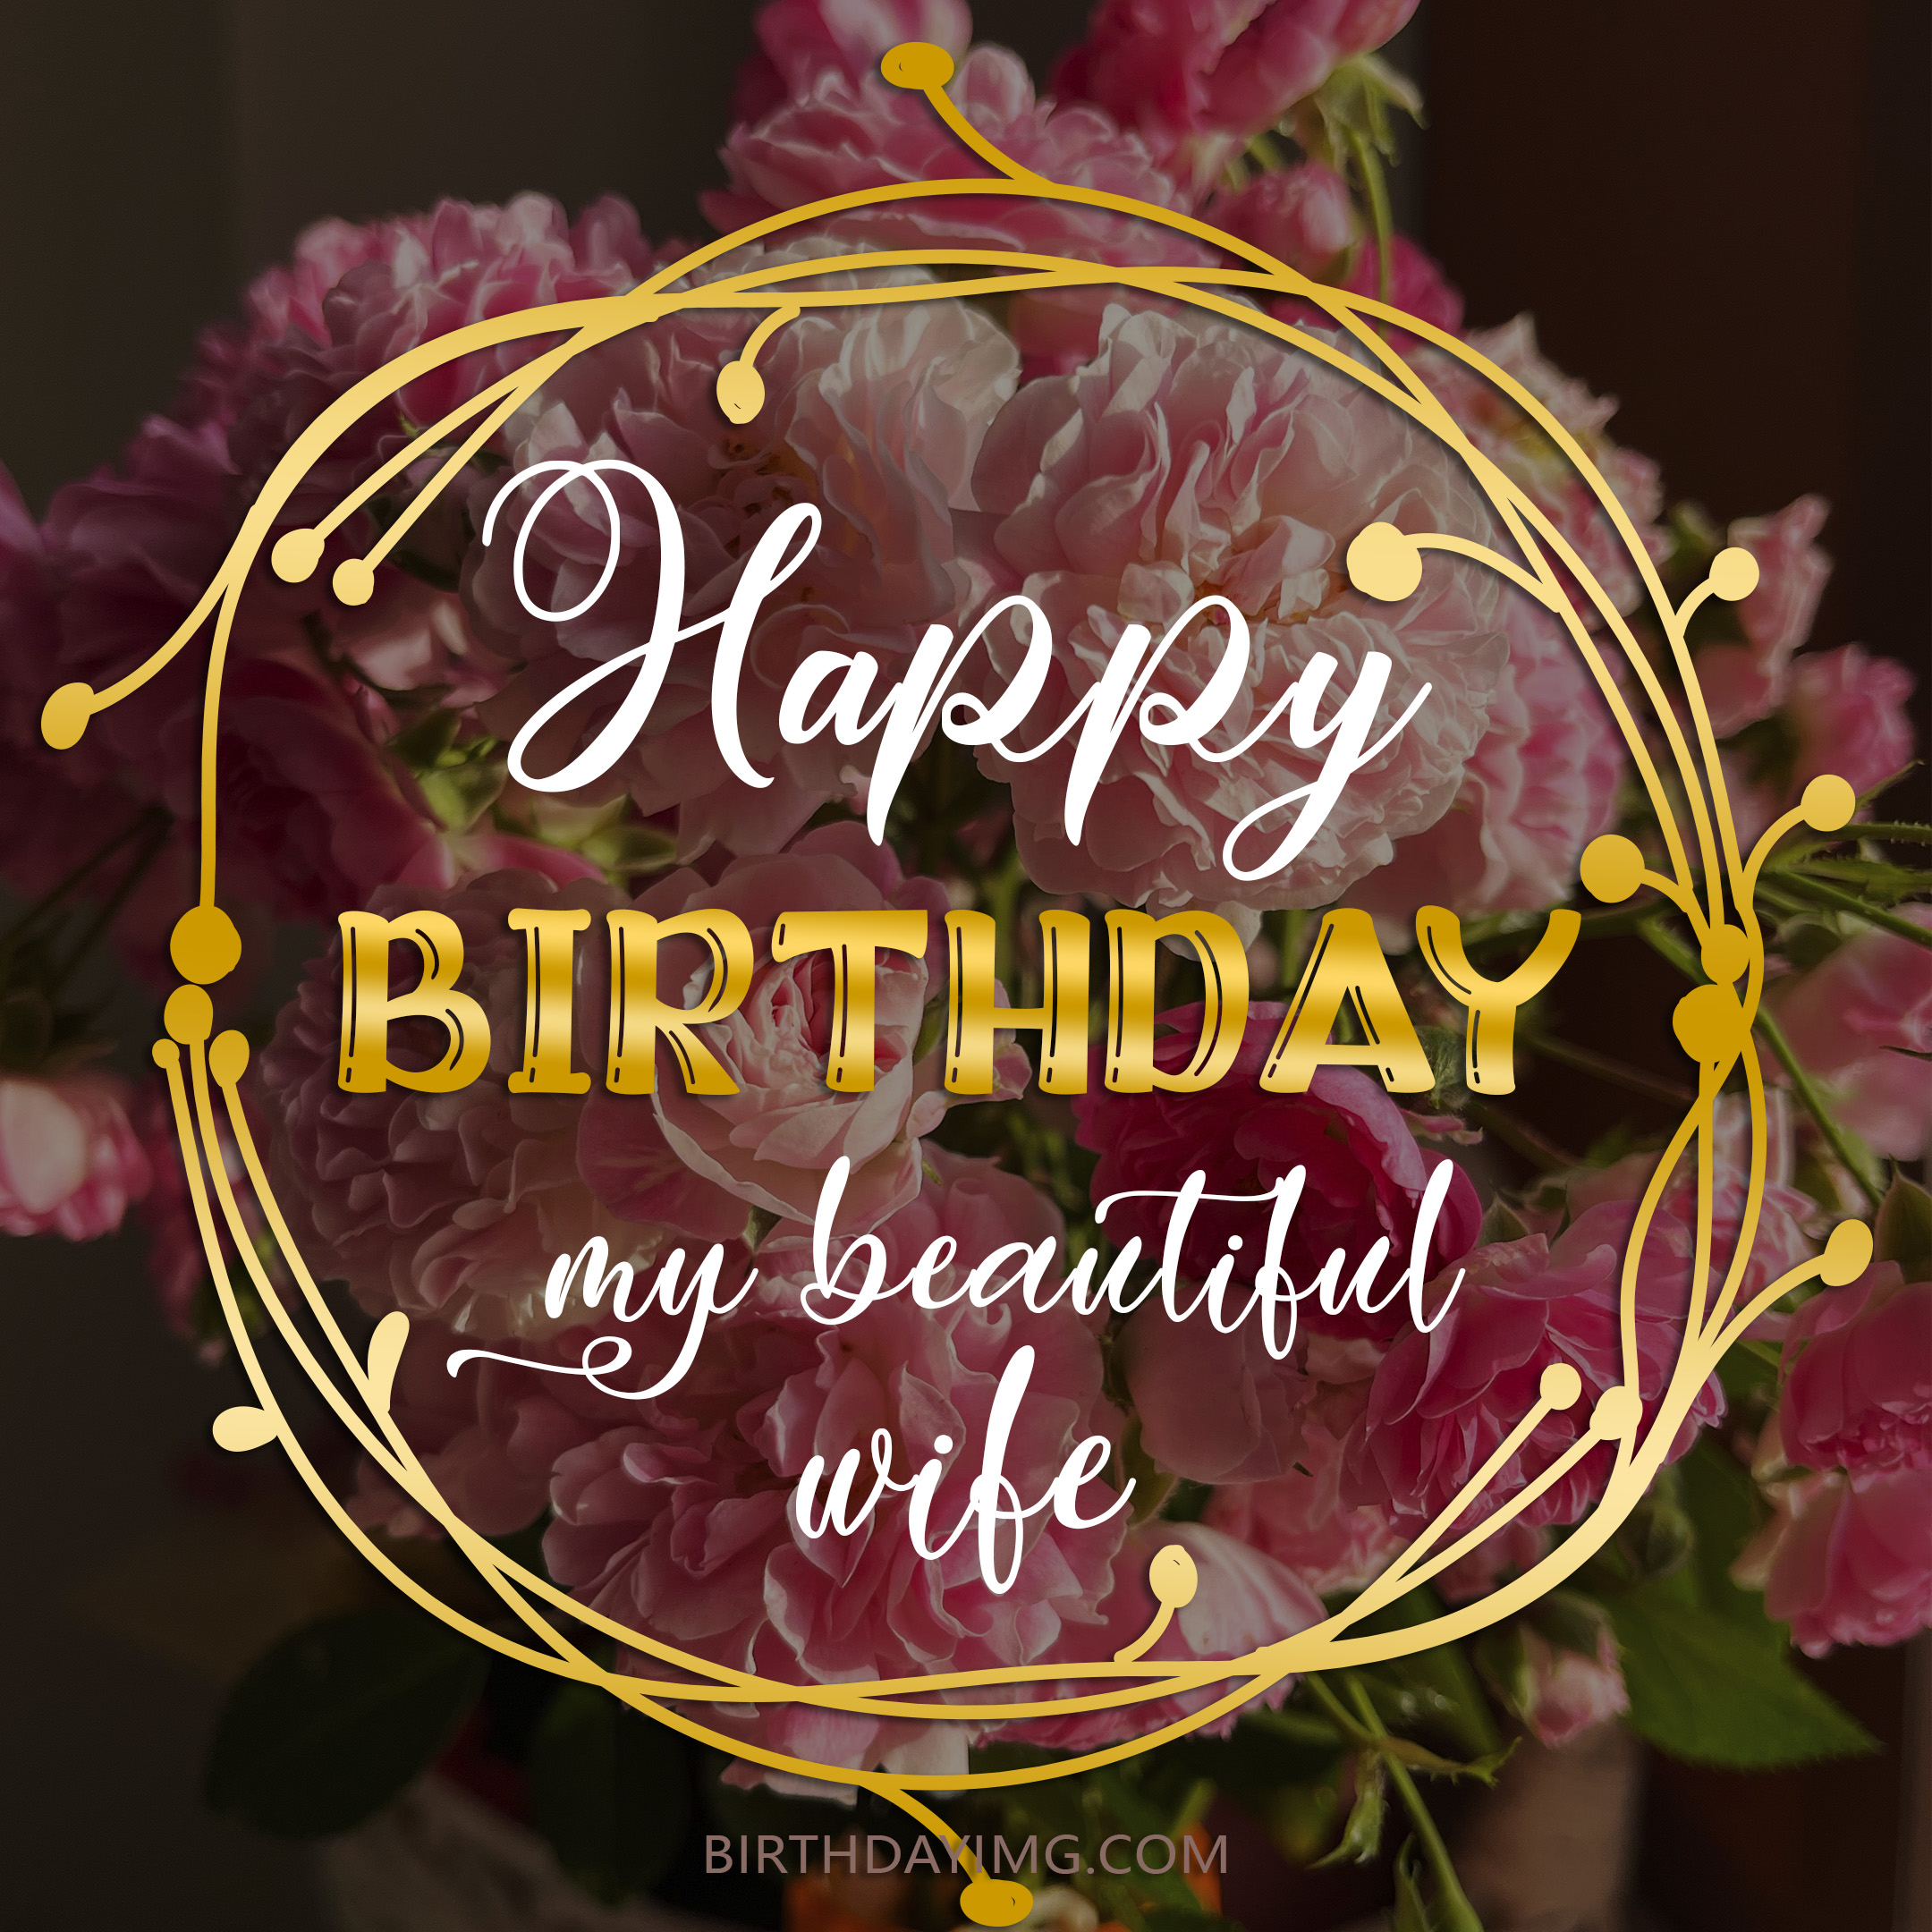 Free Happy Birthday Image For Wife With Peonie Flowers - birthdayimg.com